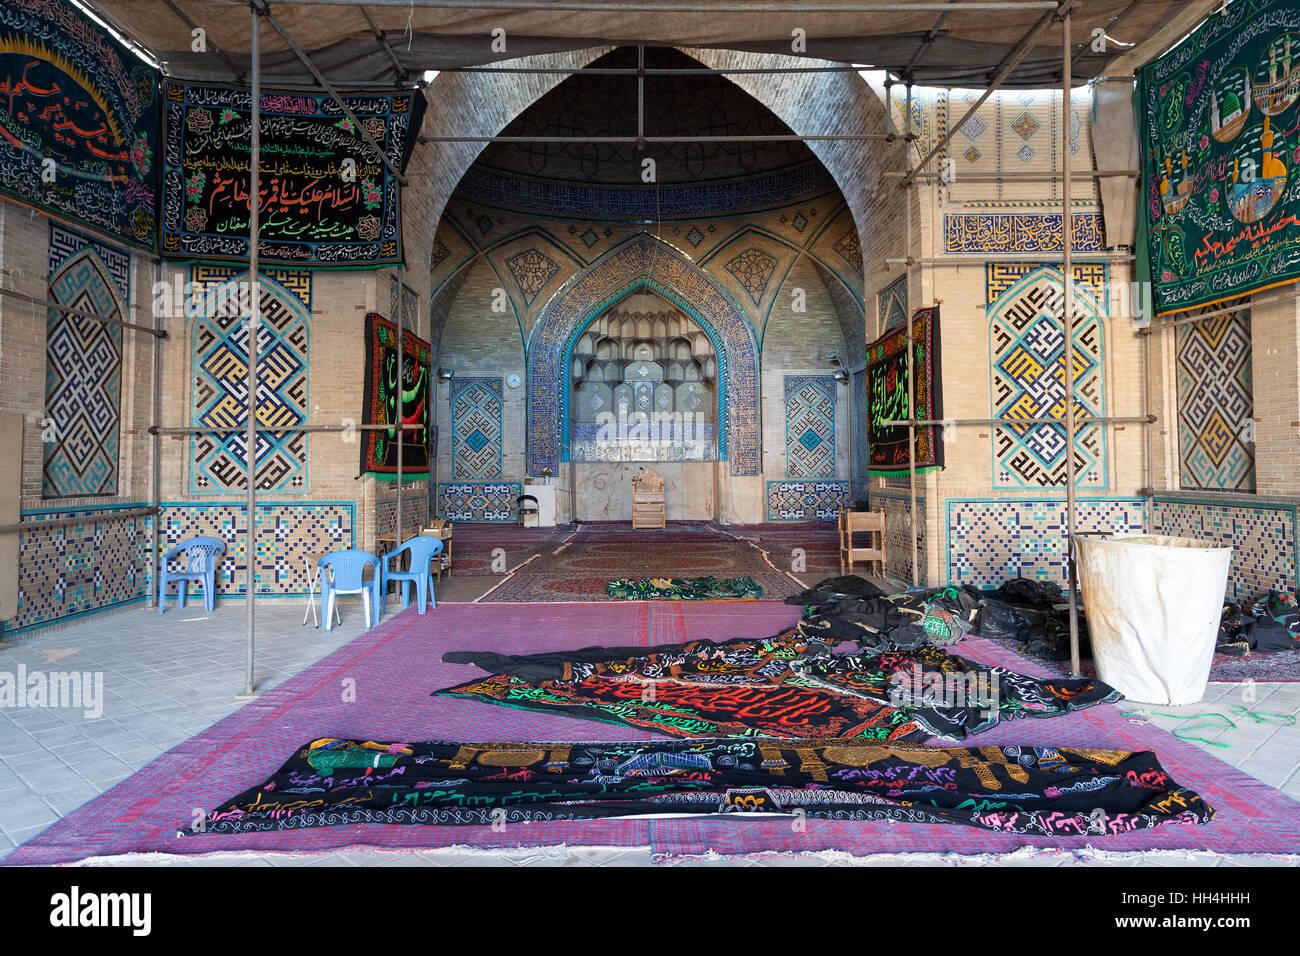 Carpets inside Hakim mosque, Isfahan, Iran - Stock Image